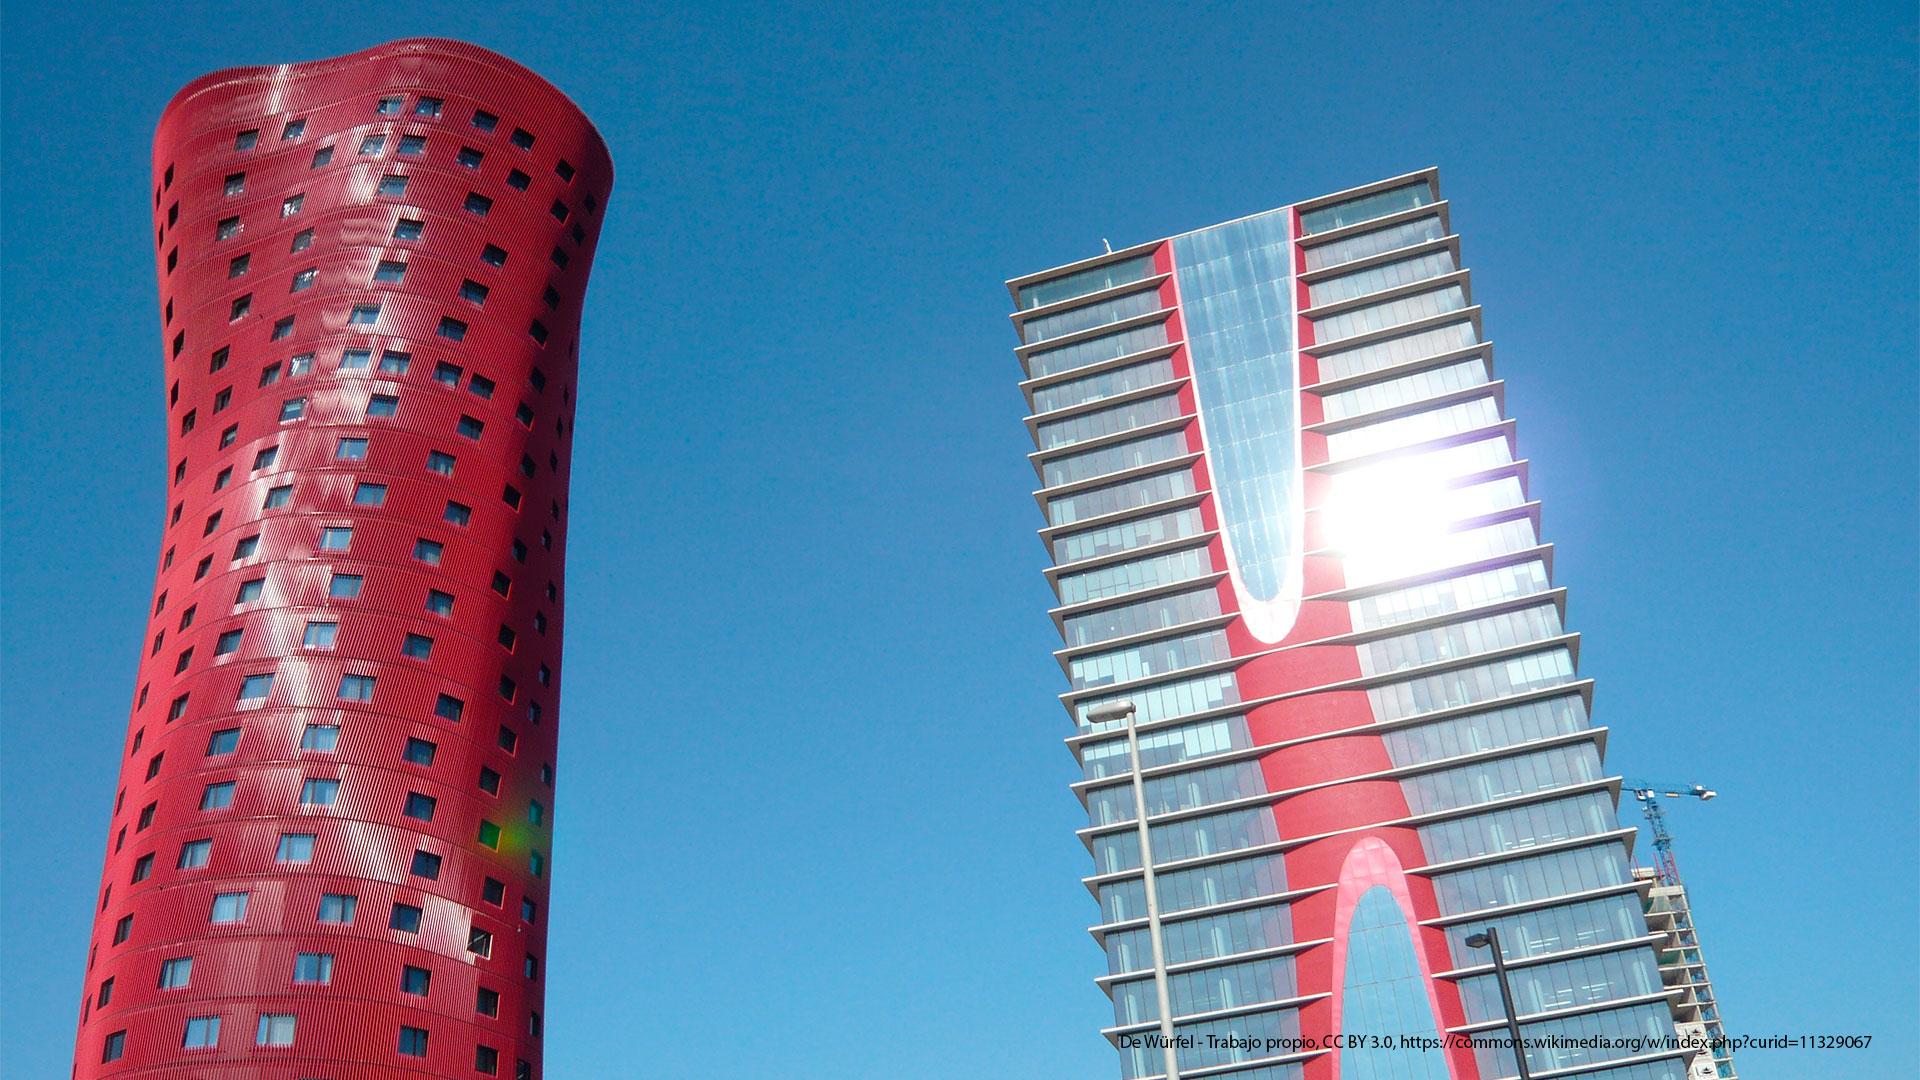 Vaciado de pisos y locales en L'Hospitalet de Llobregat